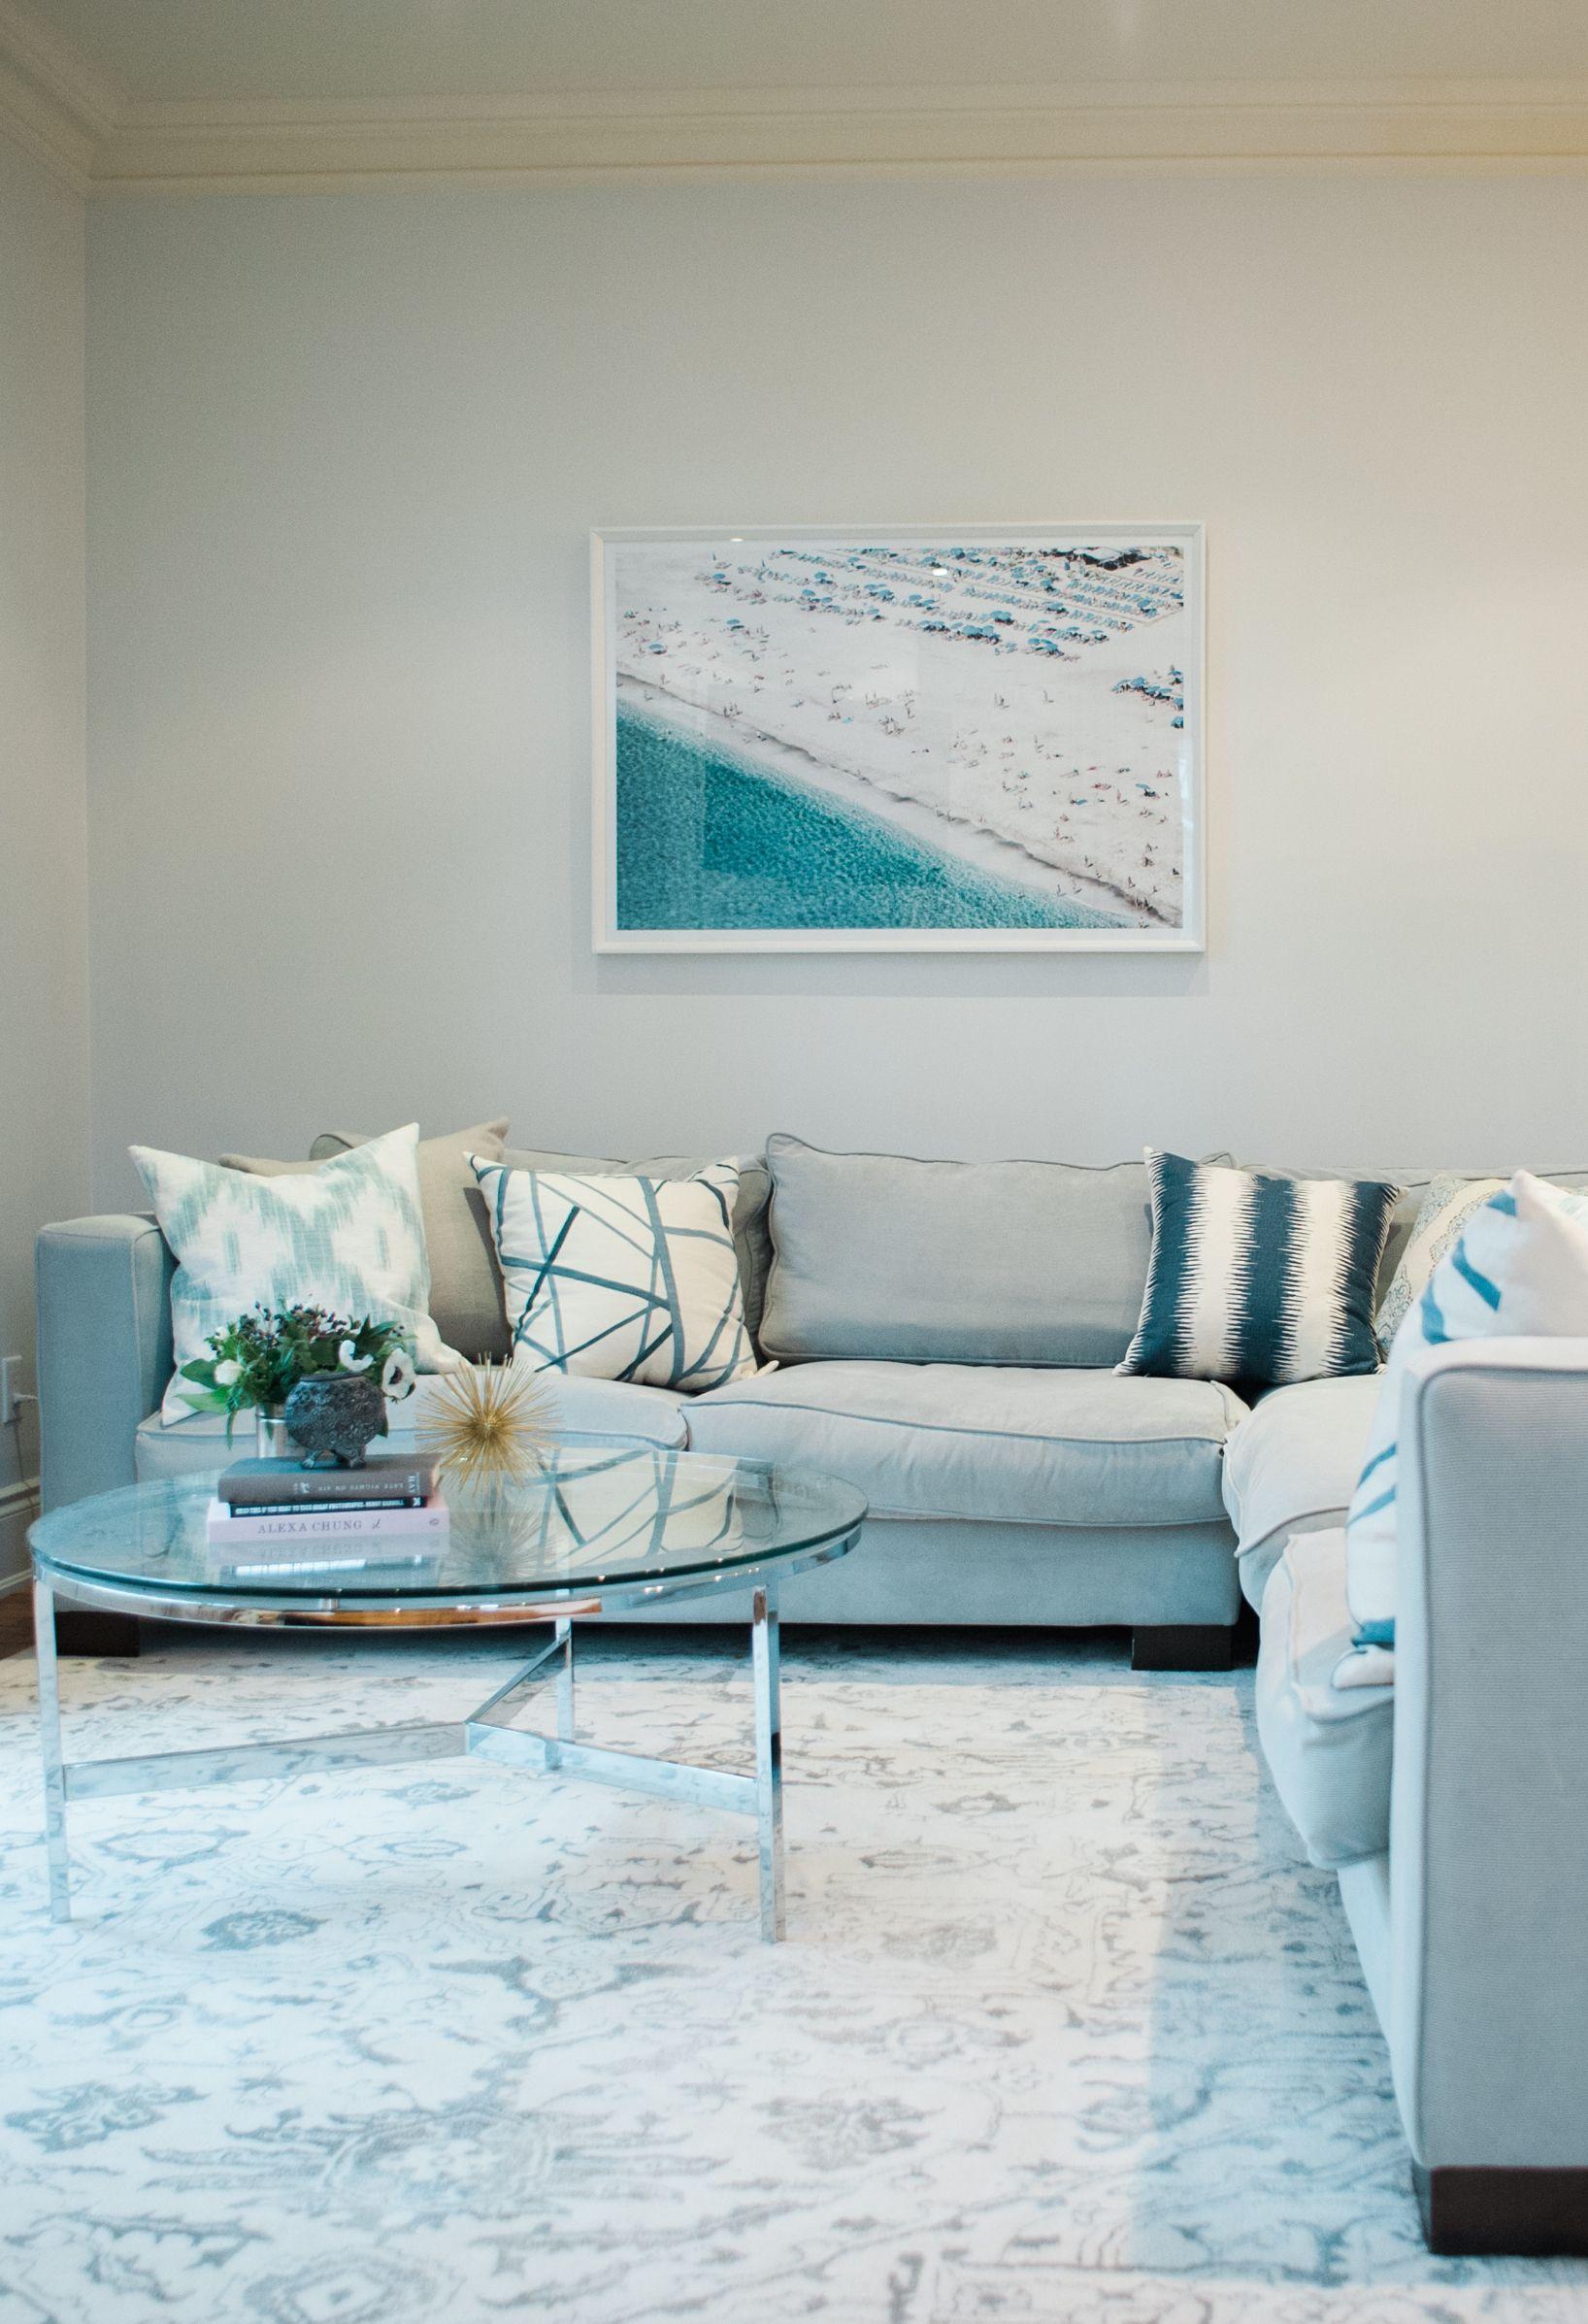 Interior Design Blogs To Follow